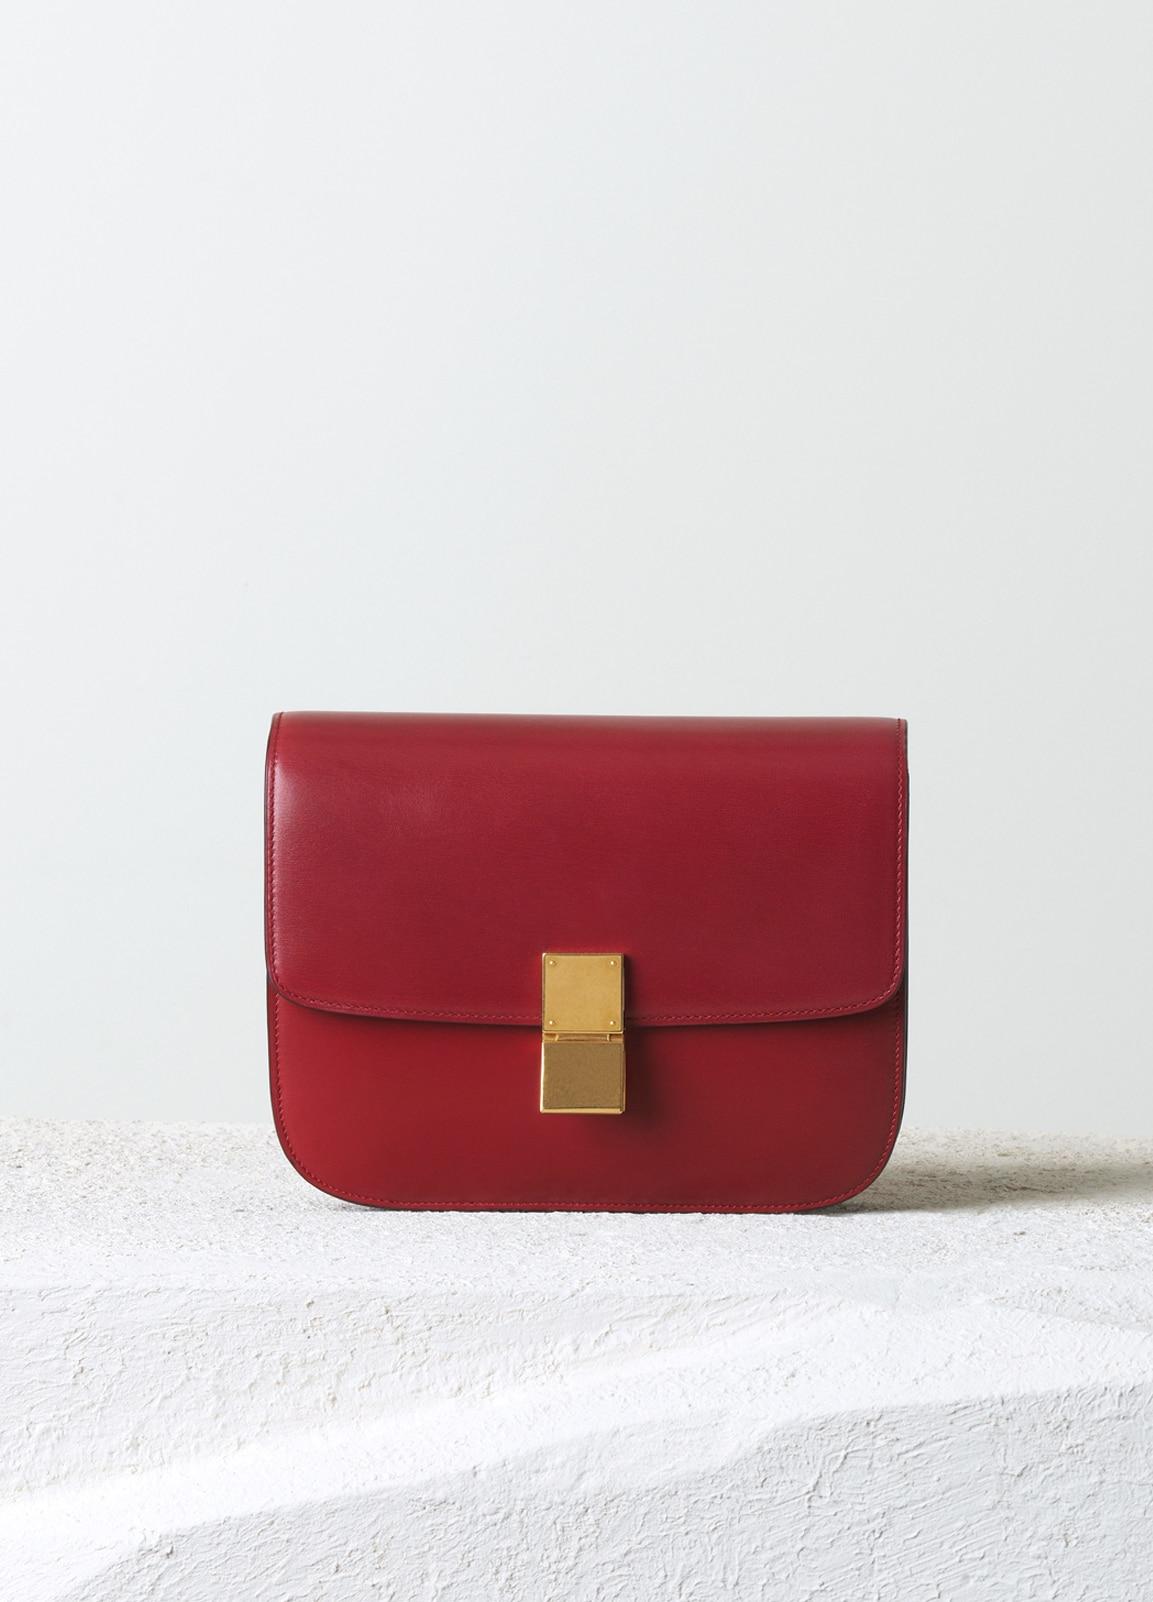 Celine Red Box Calfskin Classic Box Medium Bag